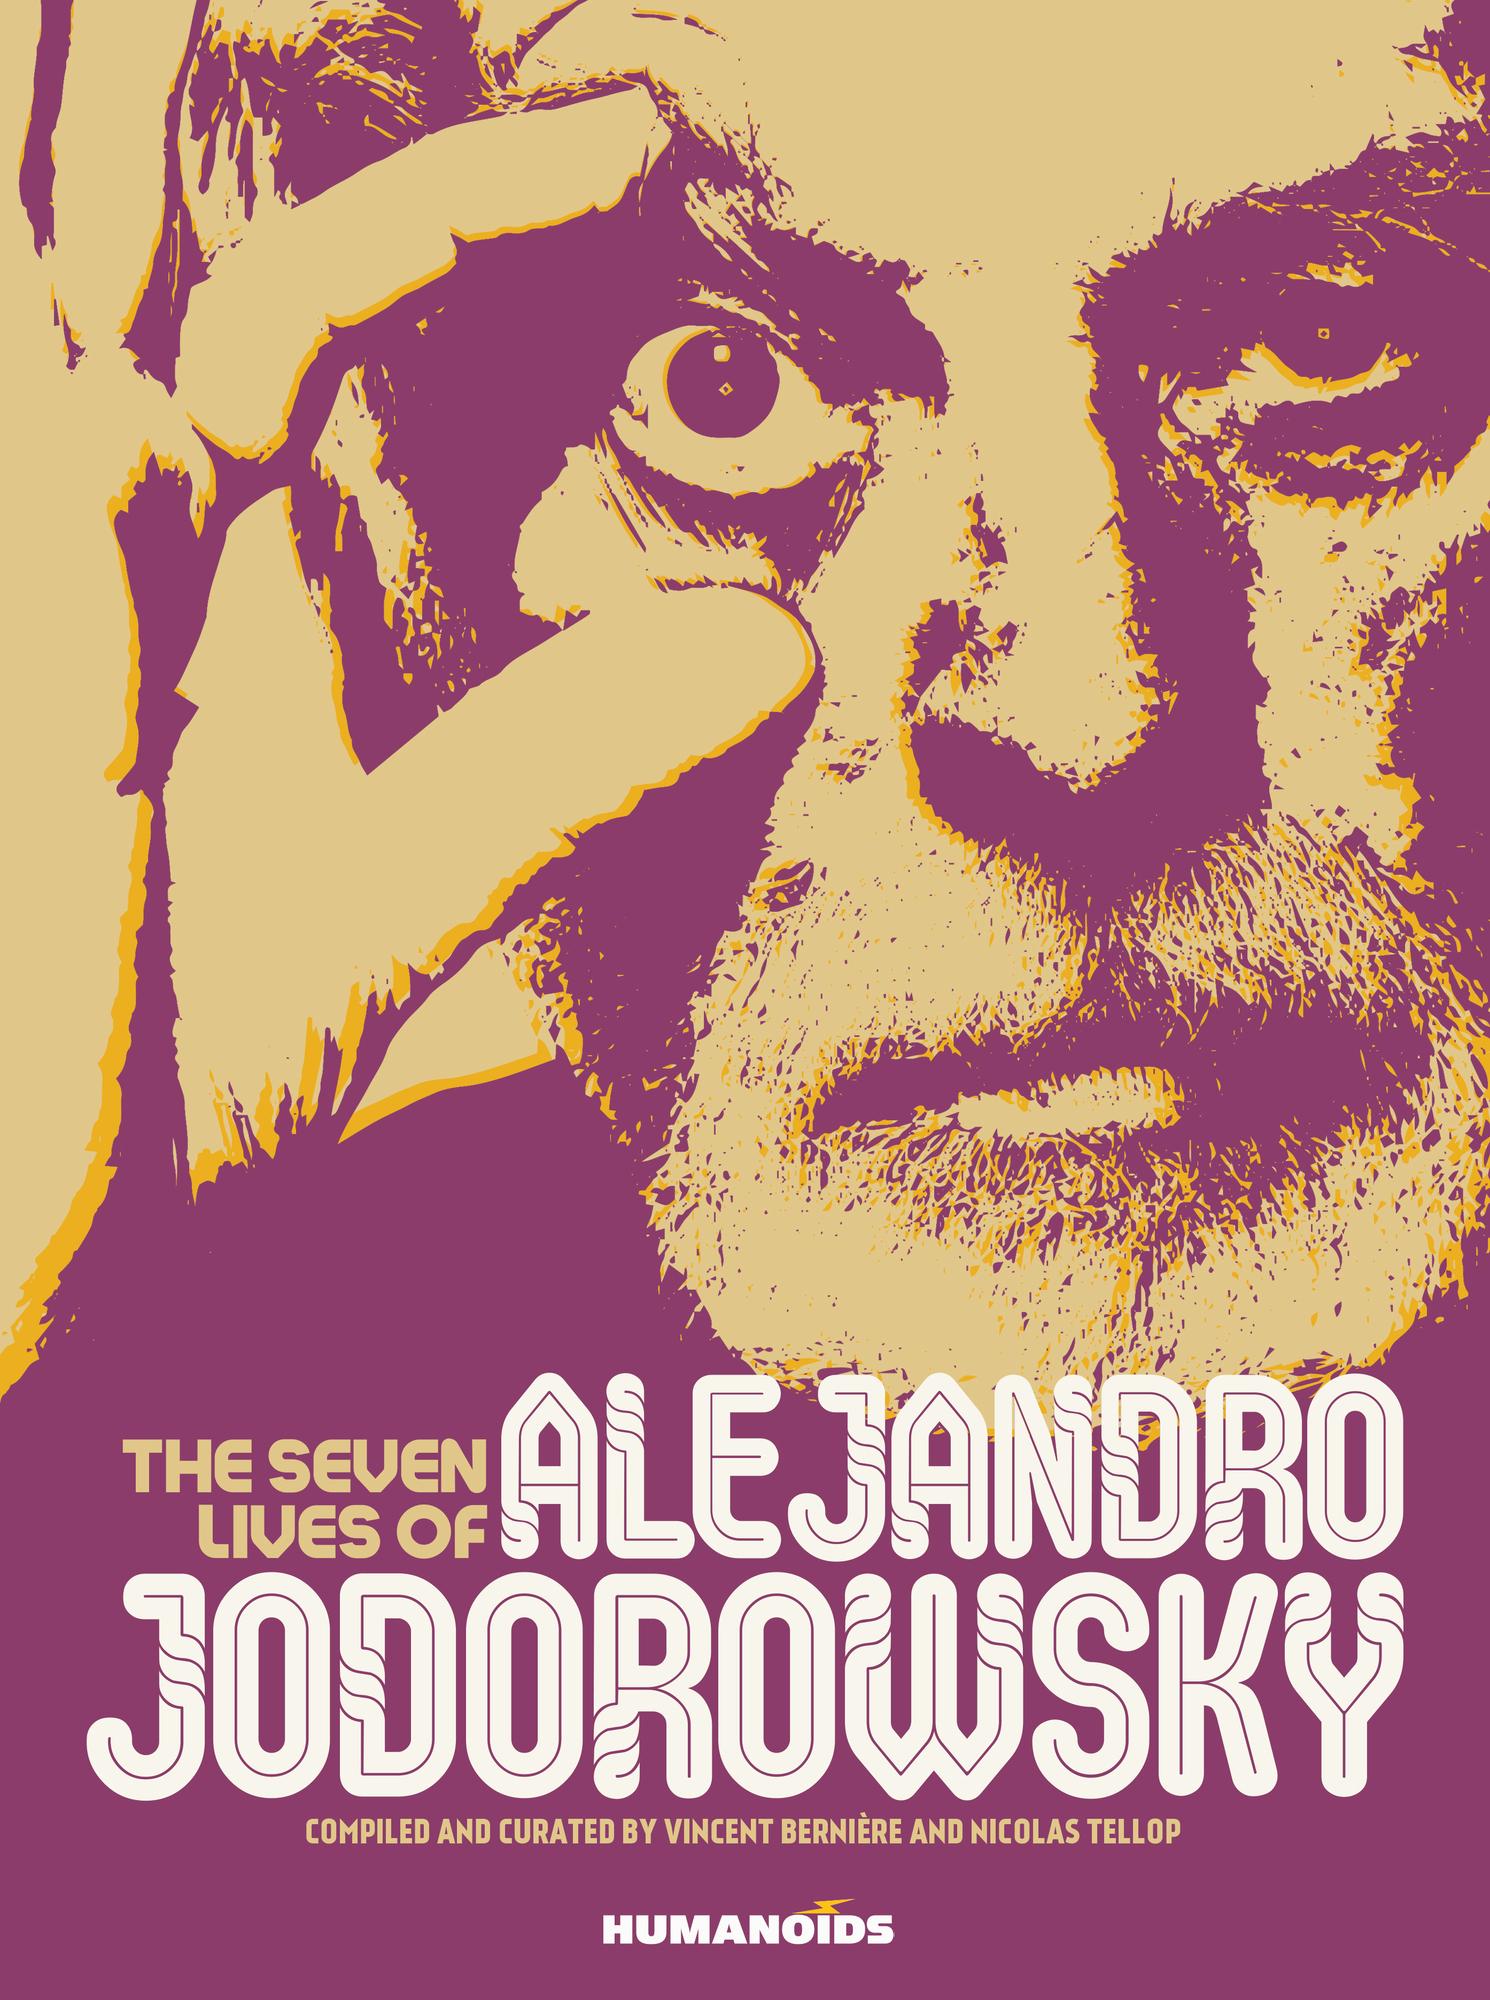 THE SEVEN LIVES OF ALEJANDRO JODOROWSKY OD-COVER.jpg